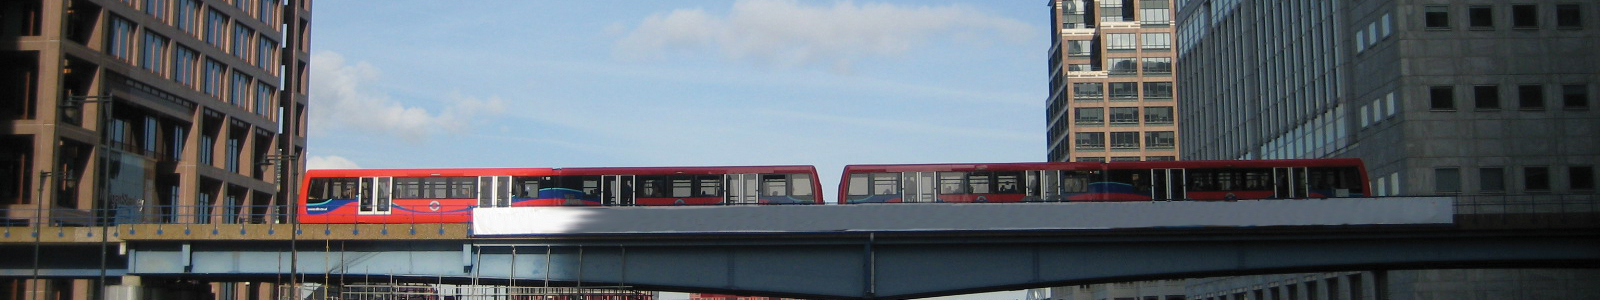 Should our rail services be renationalised? Readers' debate